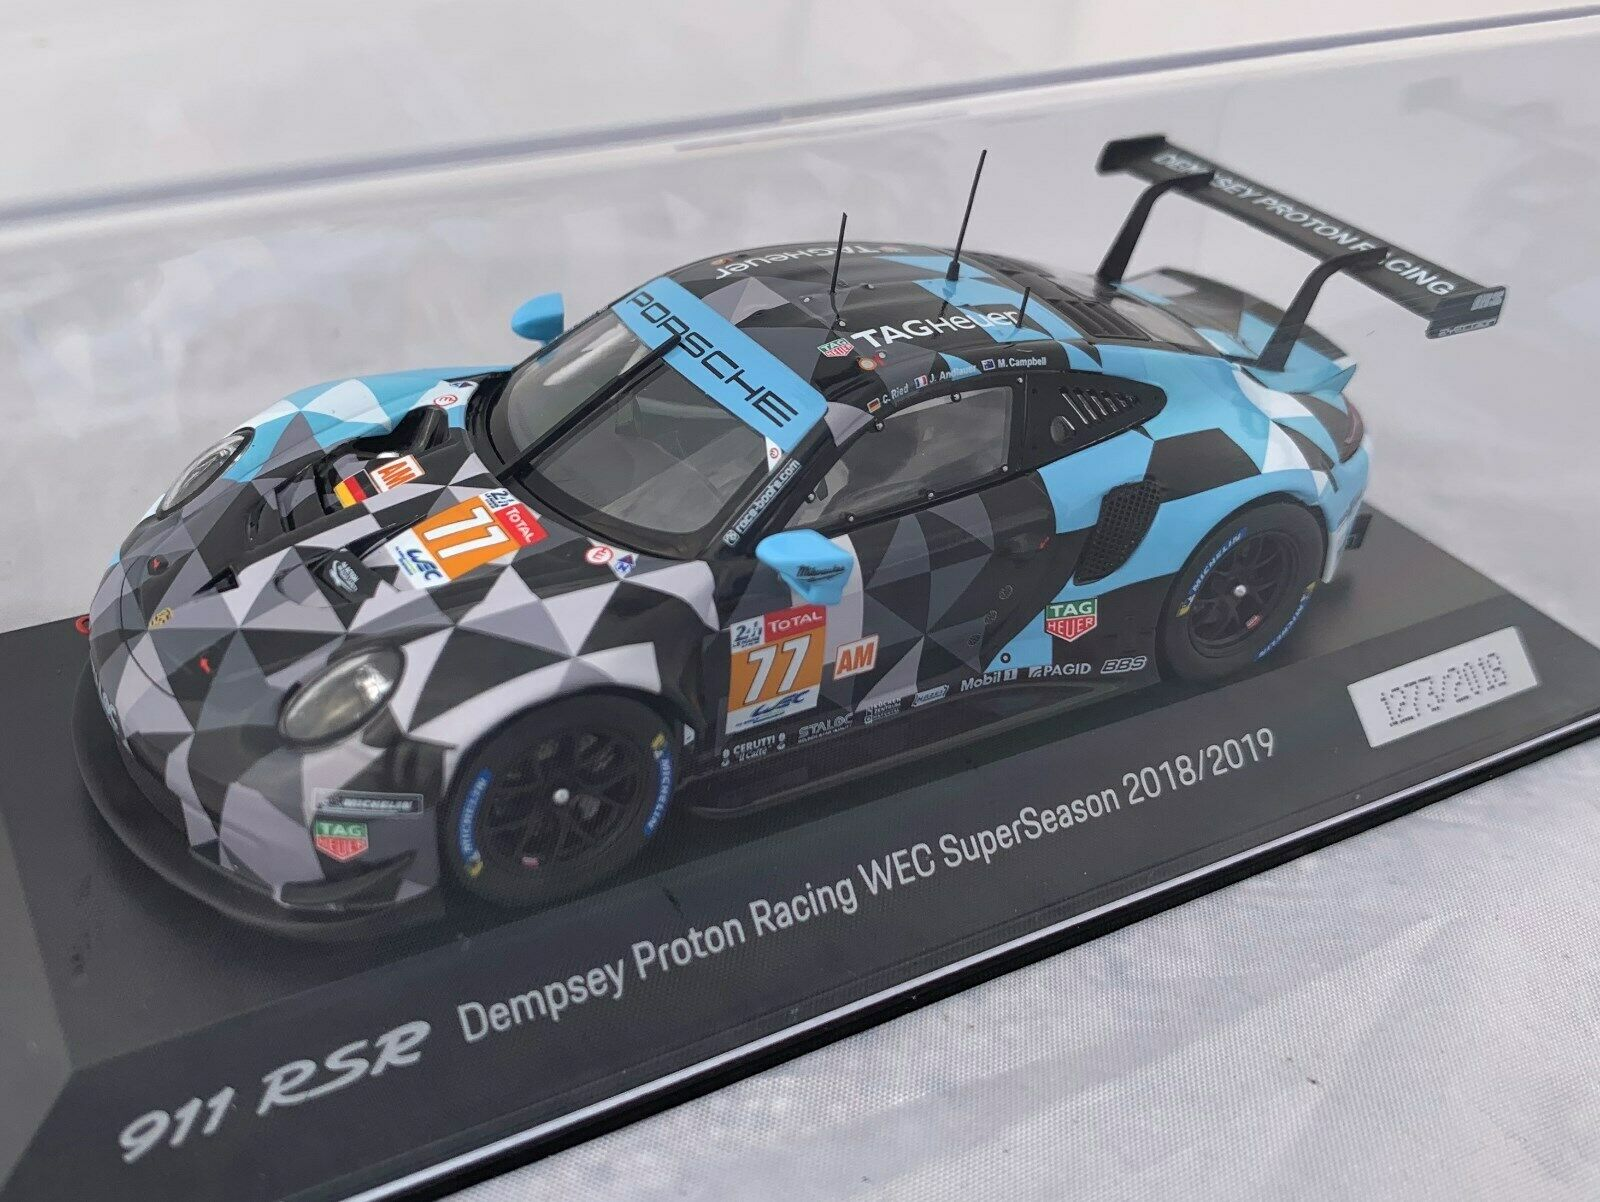 Precio por piso Porsche Porsche Porsche 911 RSR Le Mans Dempsey projoones Racing WEC 1 43 Limitada Minichamps Spark  hasta un 70% de descuento